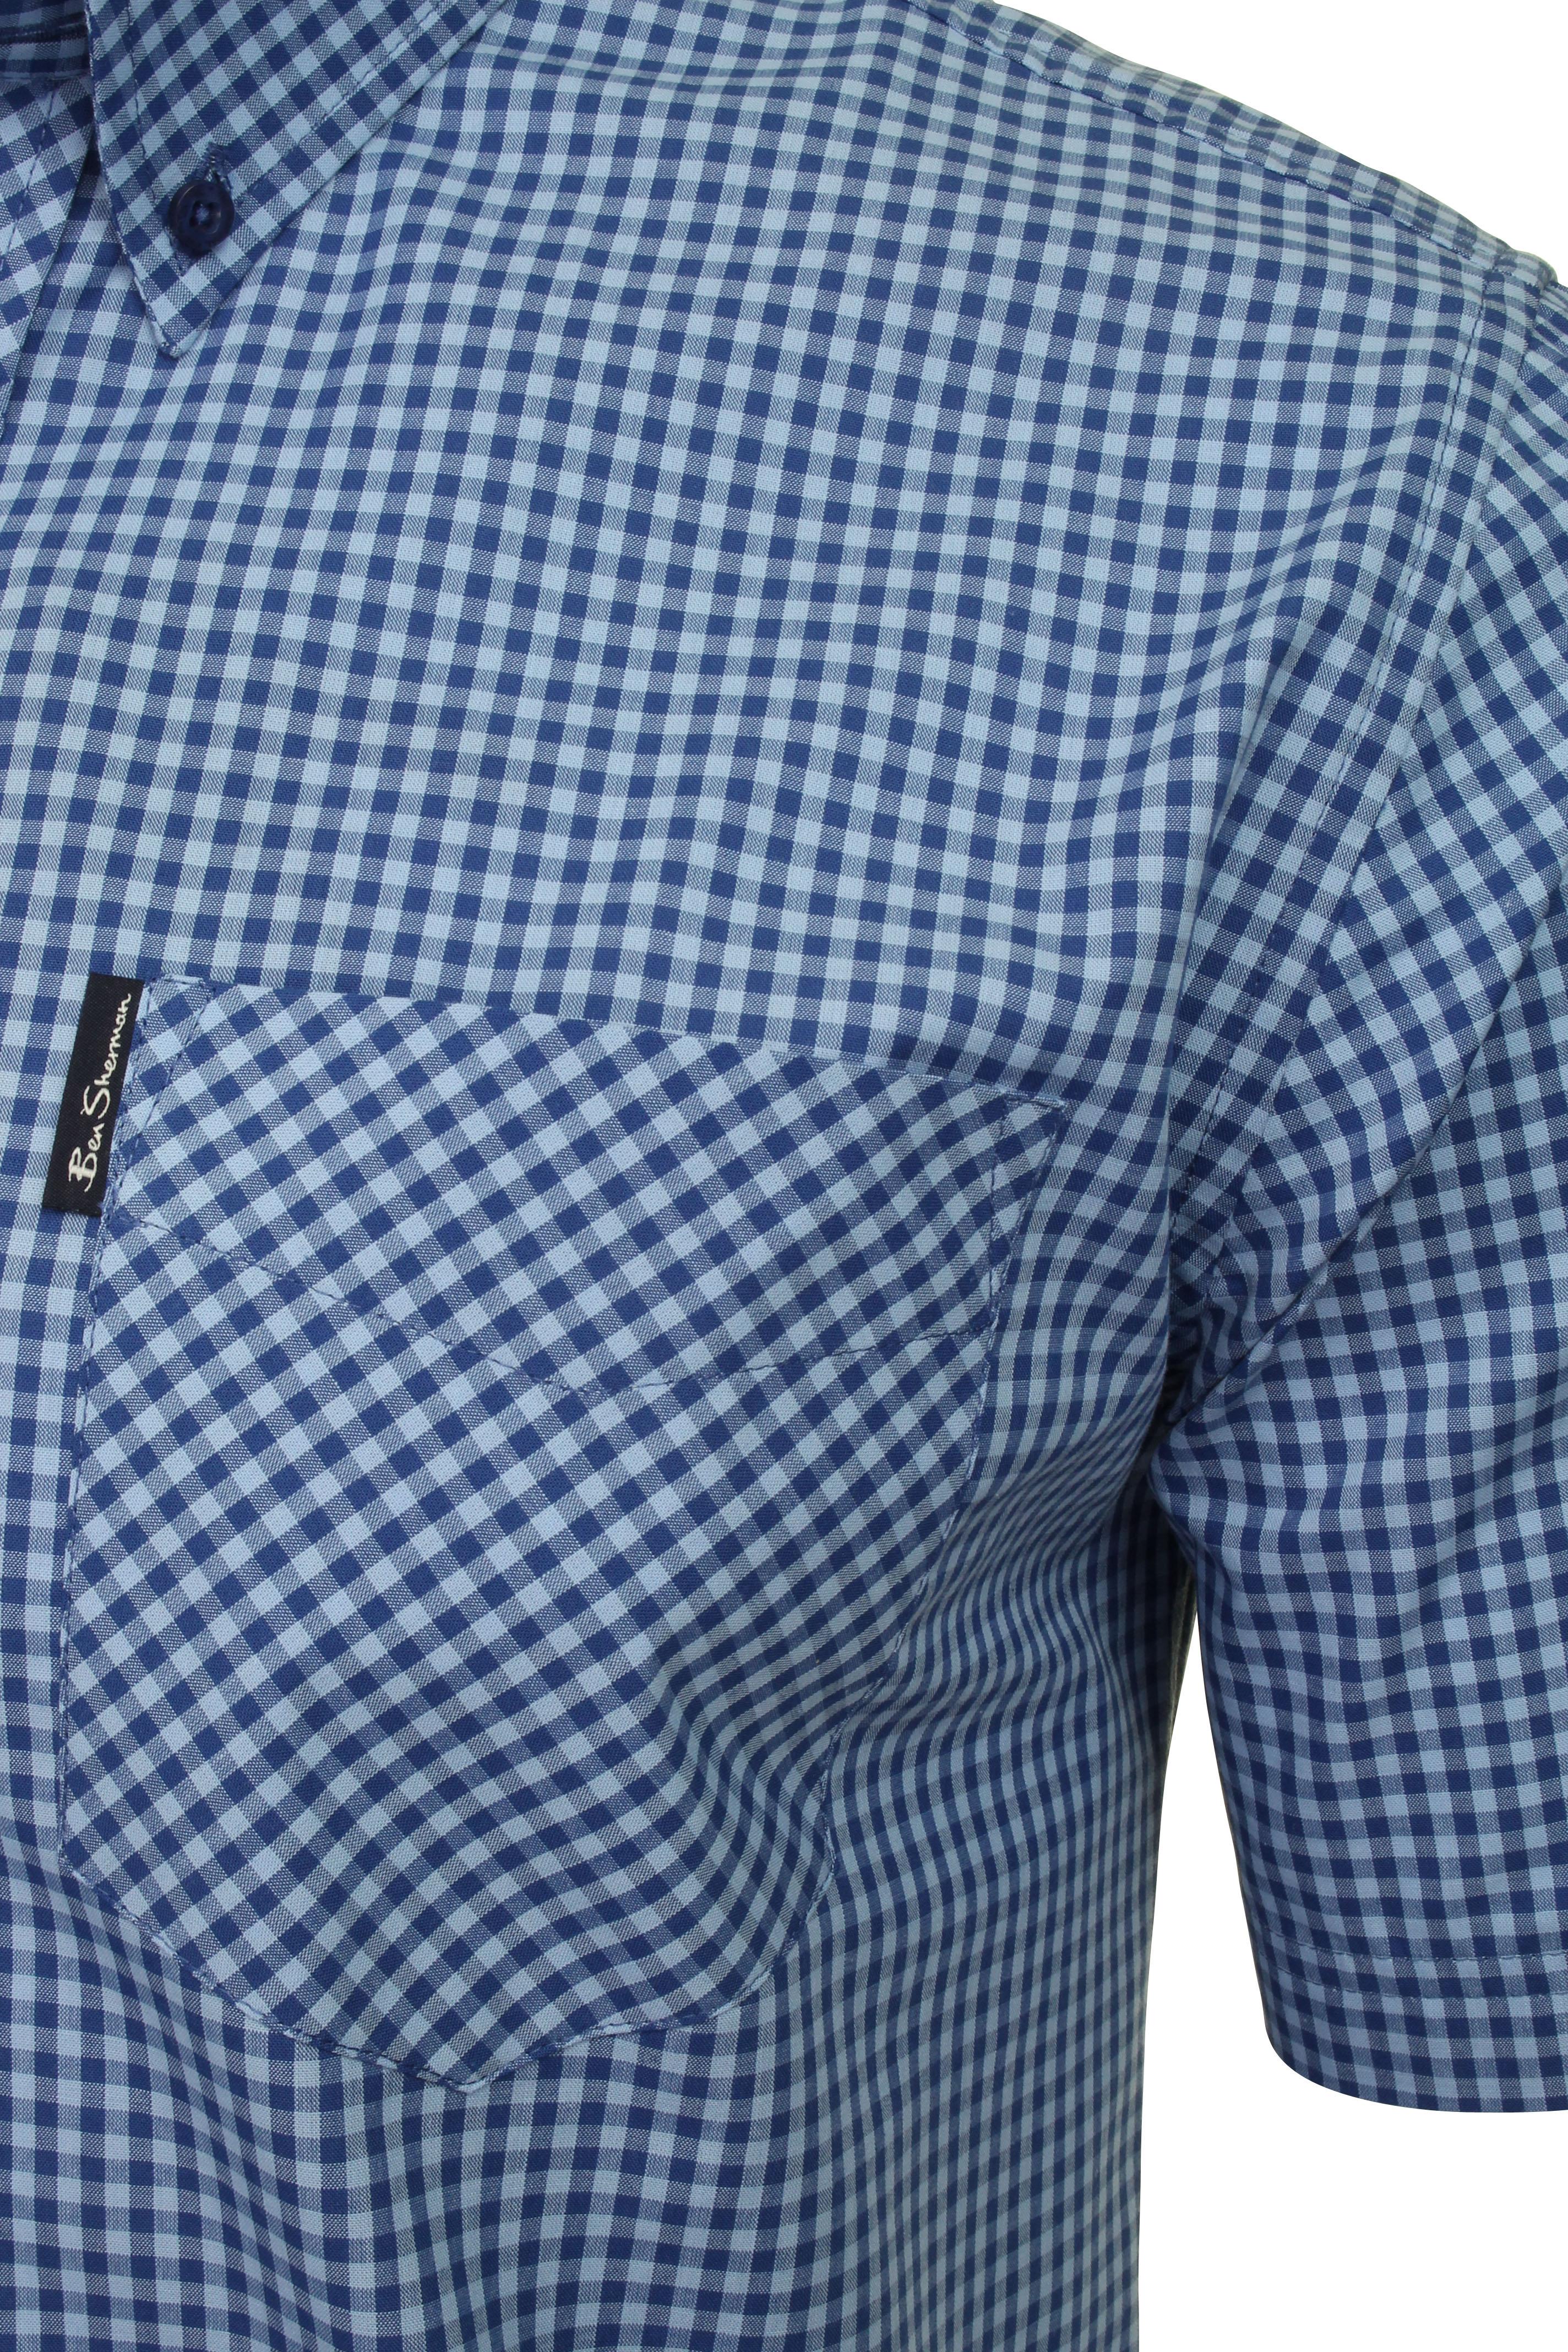 Ben-Sherman-Mens-Short-Sleeved-Gingham-Check-Shirt thumbnail 10